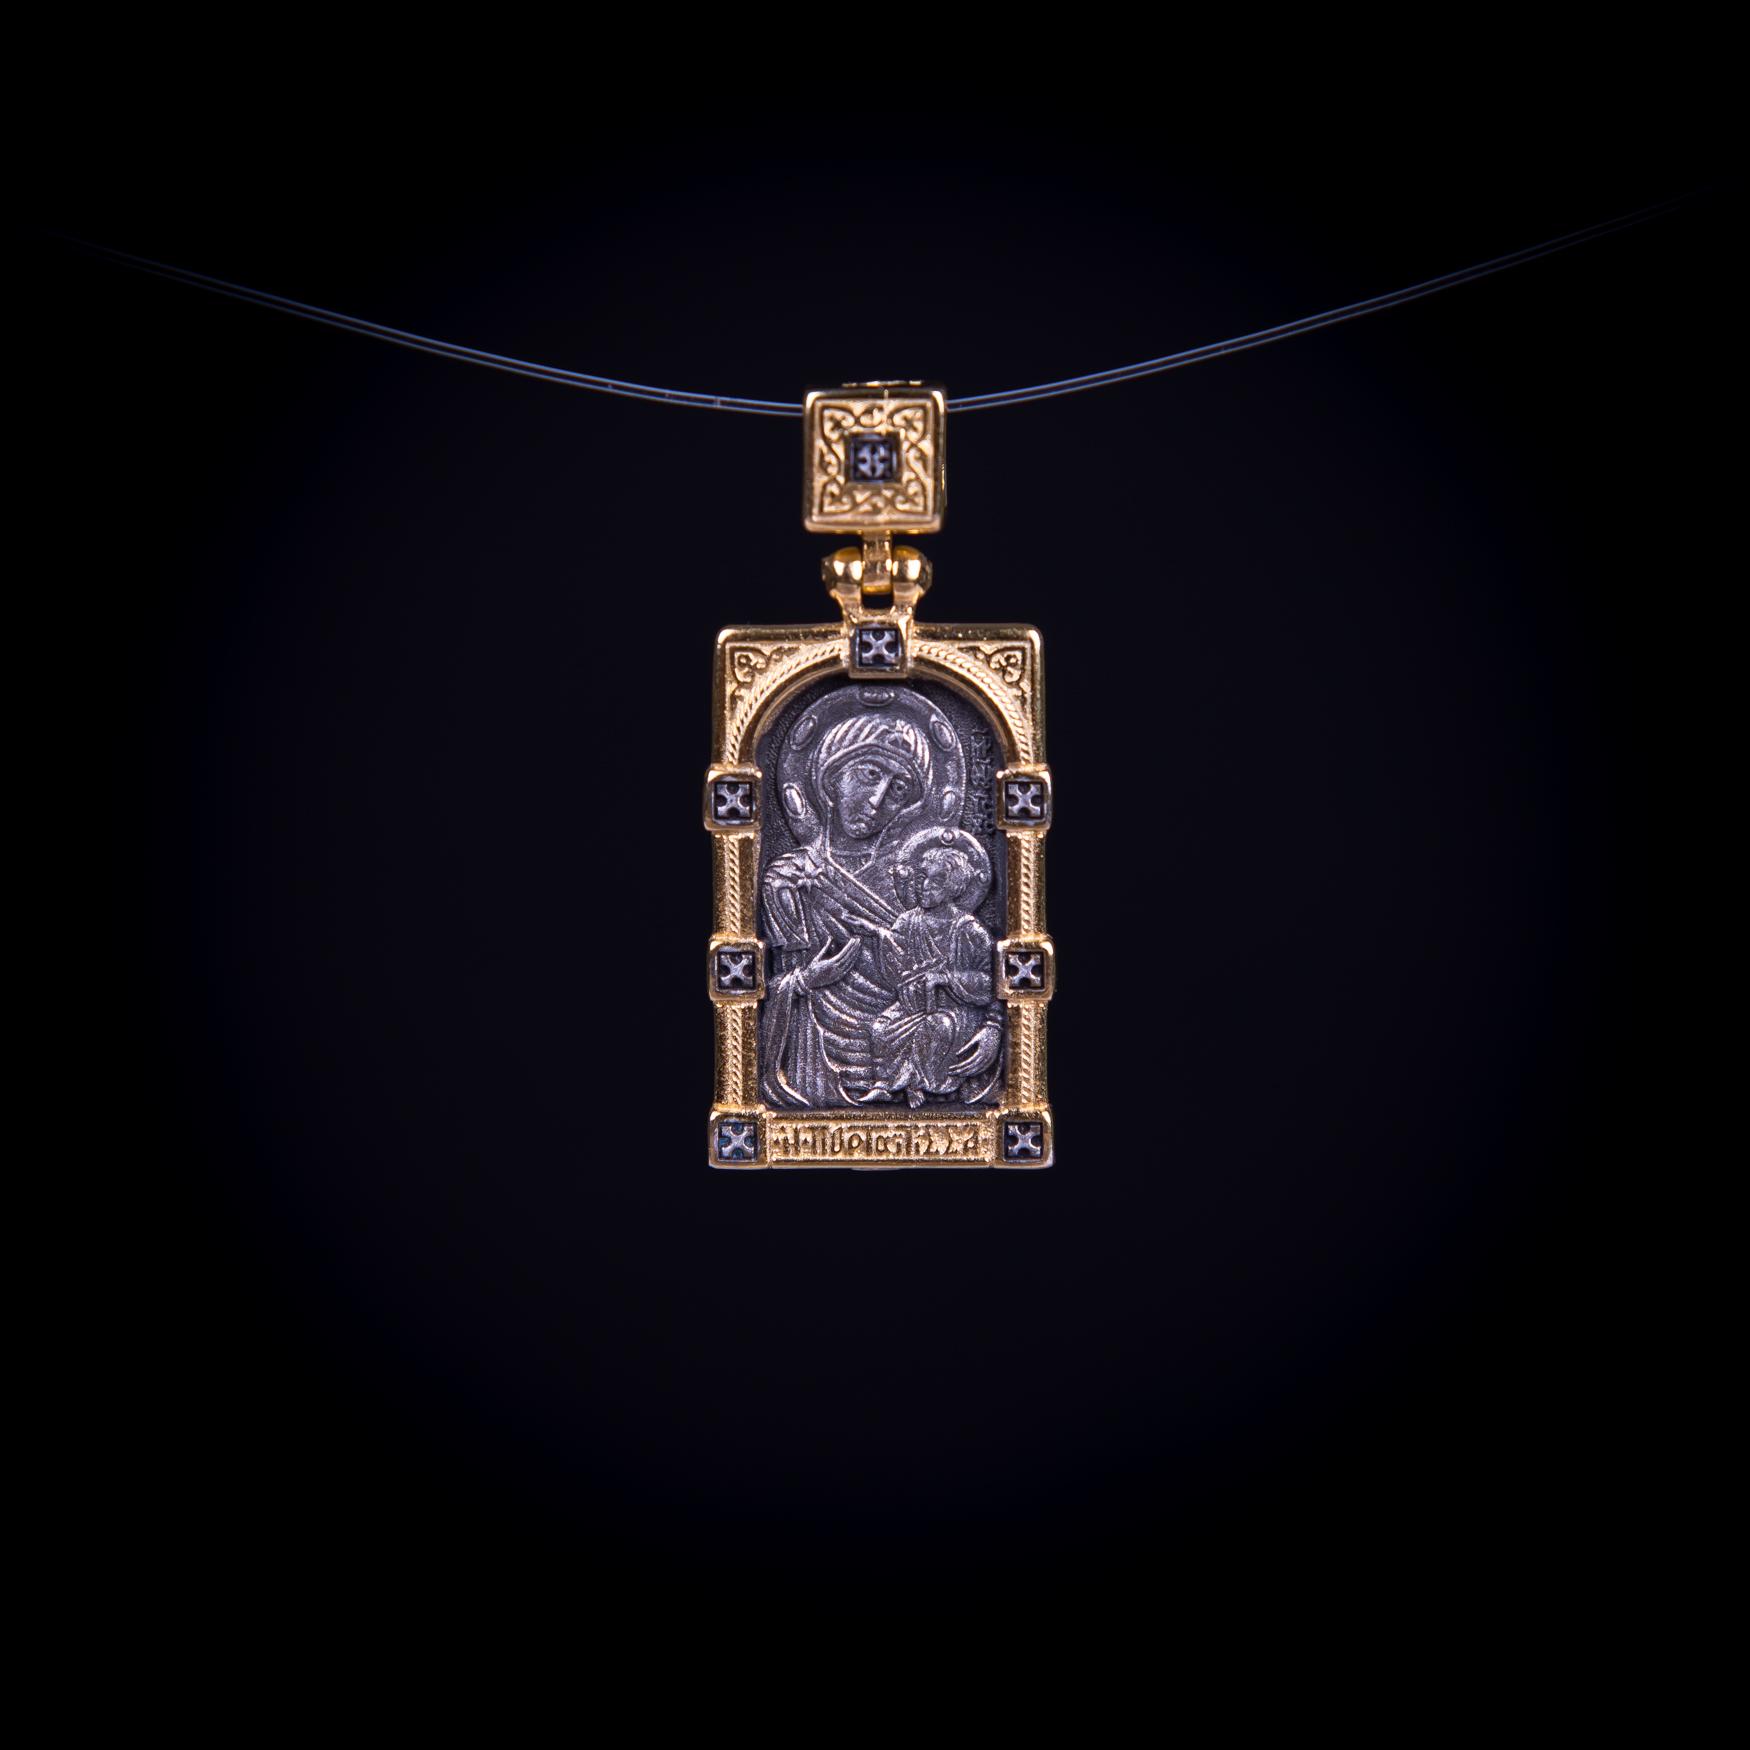 003/0048  A medal of virgin Mary